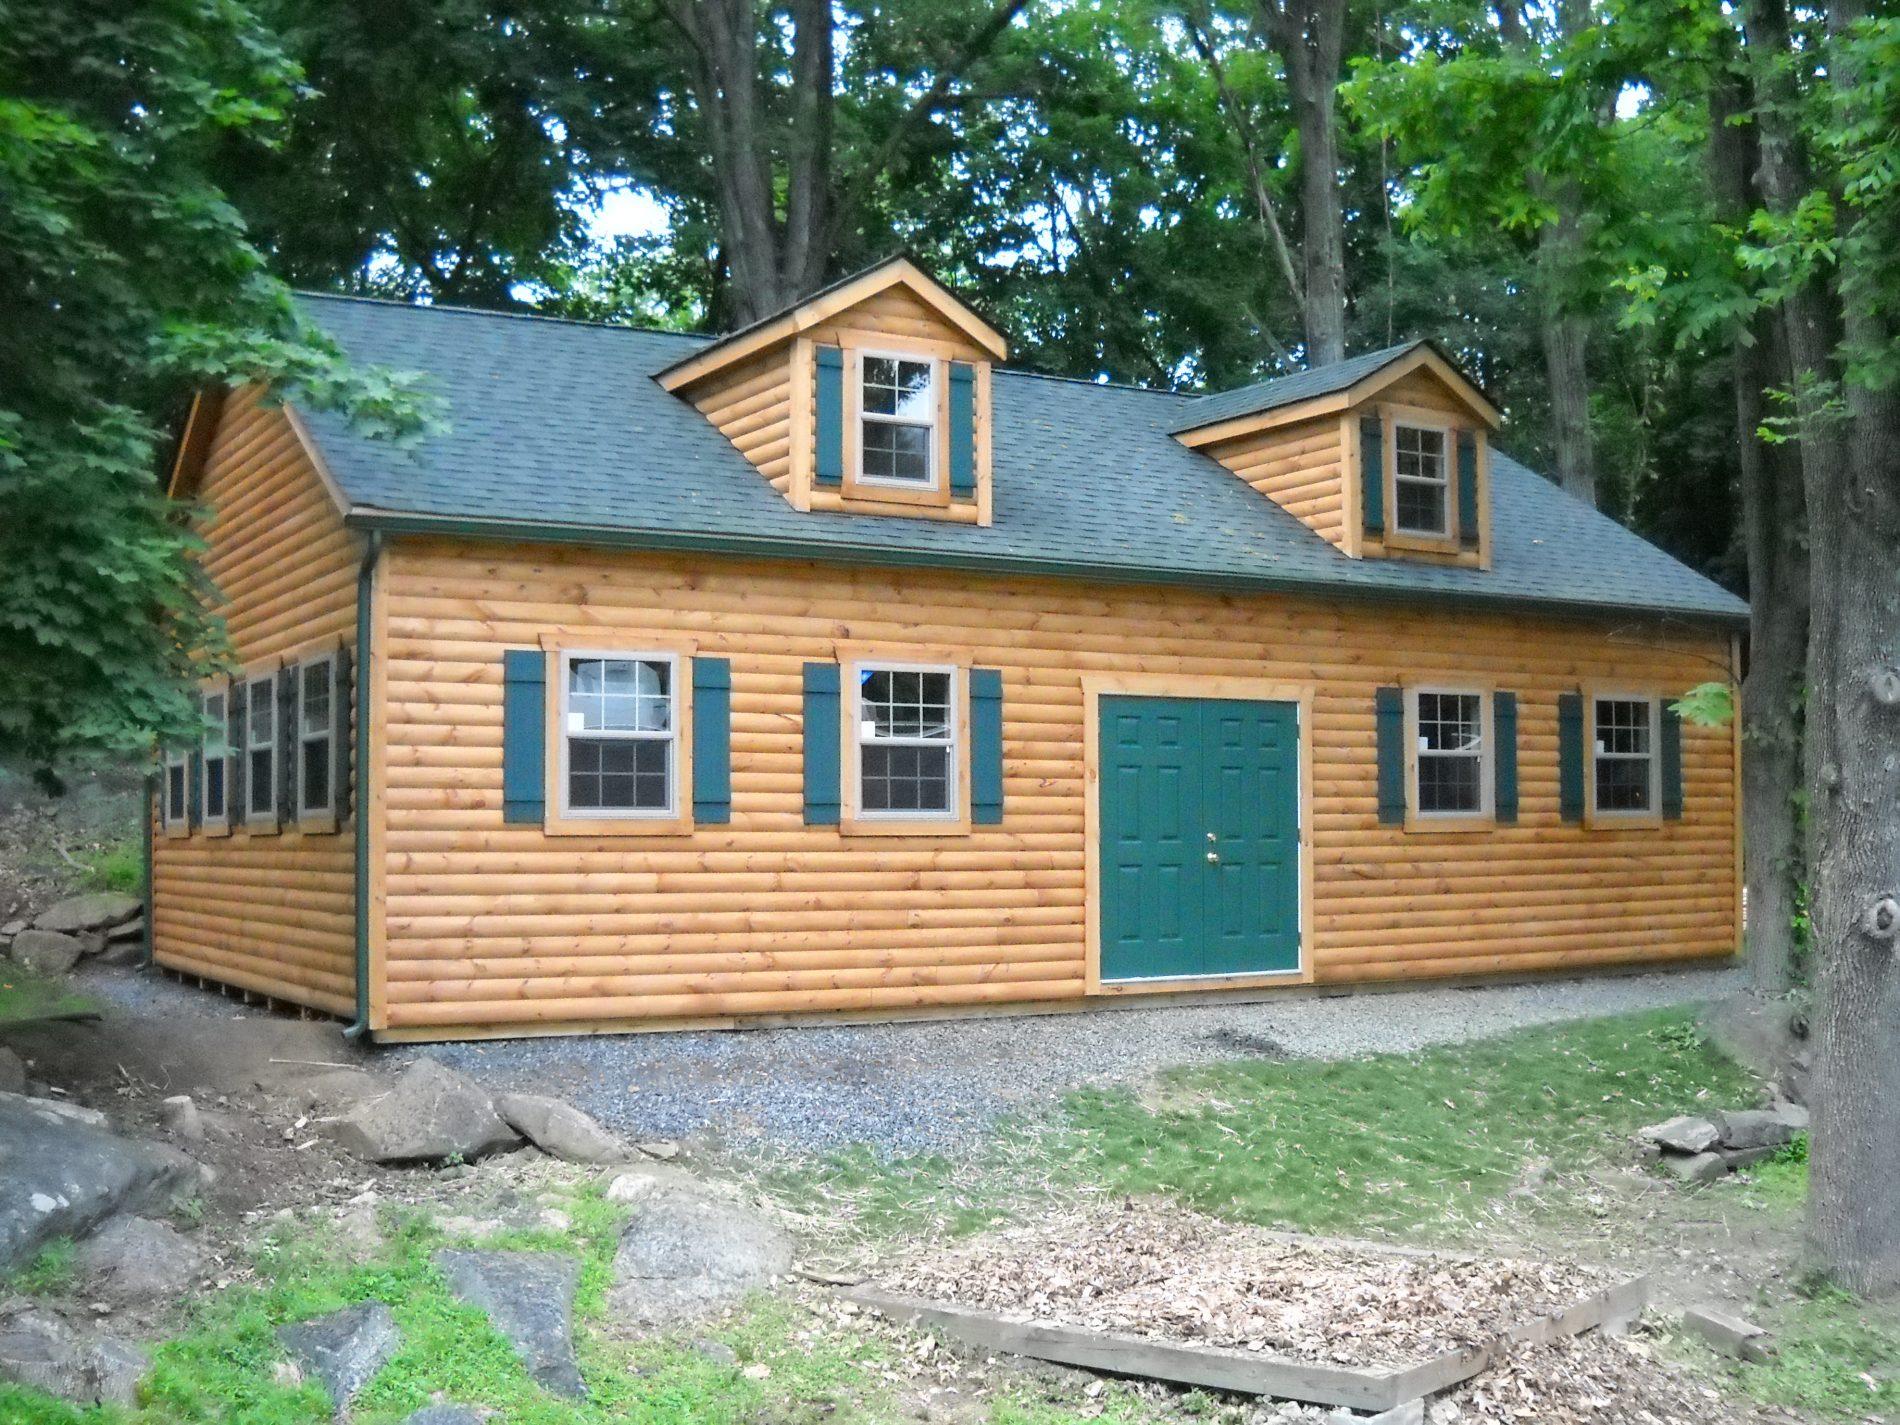 Custom garage builders prefab garages for sale zook cabins for Custom home garage